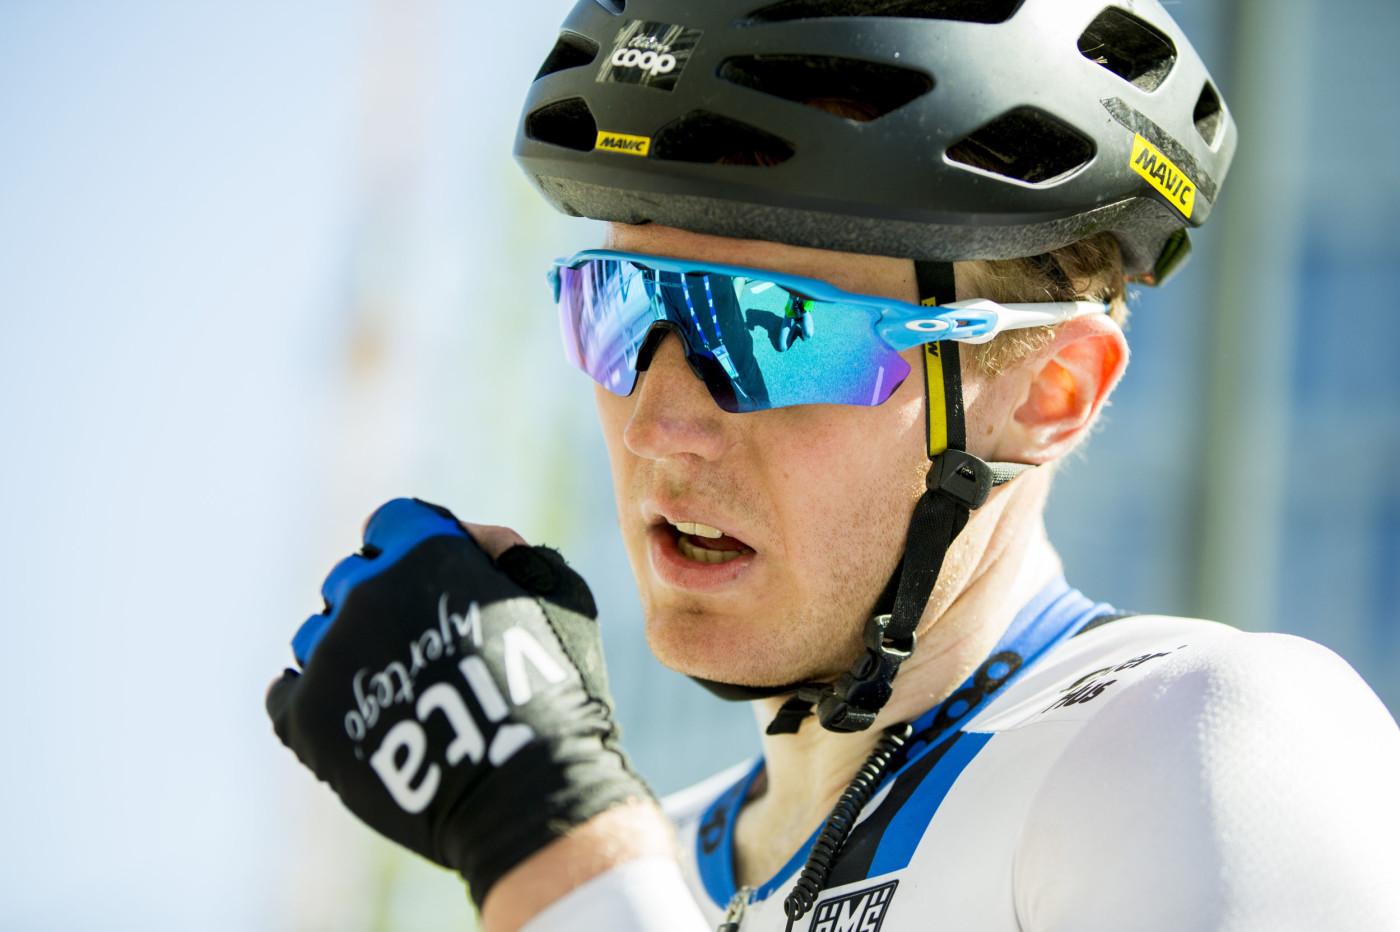 NY PROFF: Team Coop-syklisten August Jensen har fått kontraktstilbud fra flere profflag. Foto: Vegard Wivestad Grøtt / NTB scanpix